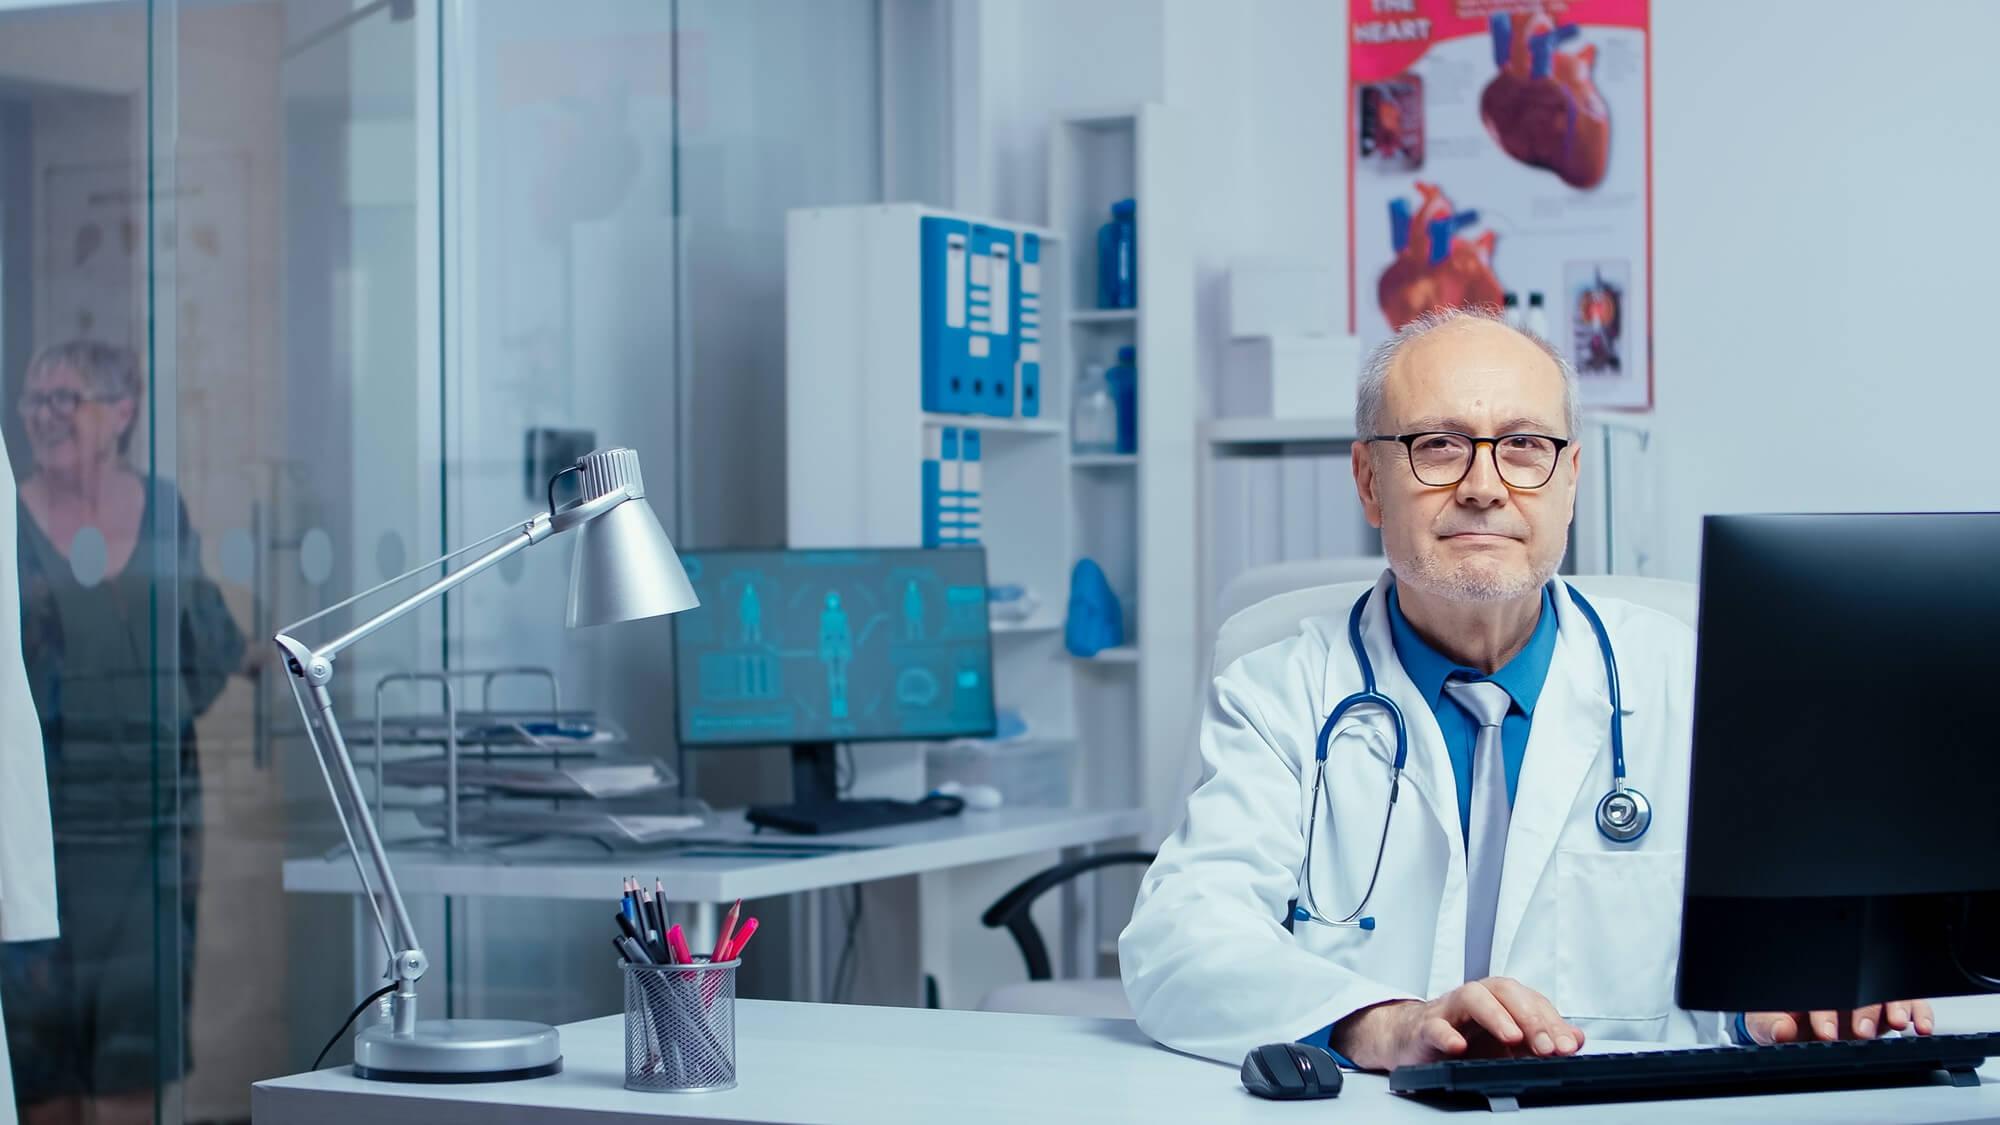 DOCTOR ATENDIENDO CONSULTA CON PACIENTE